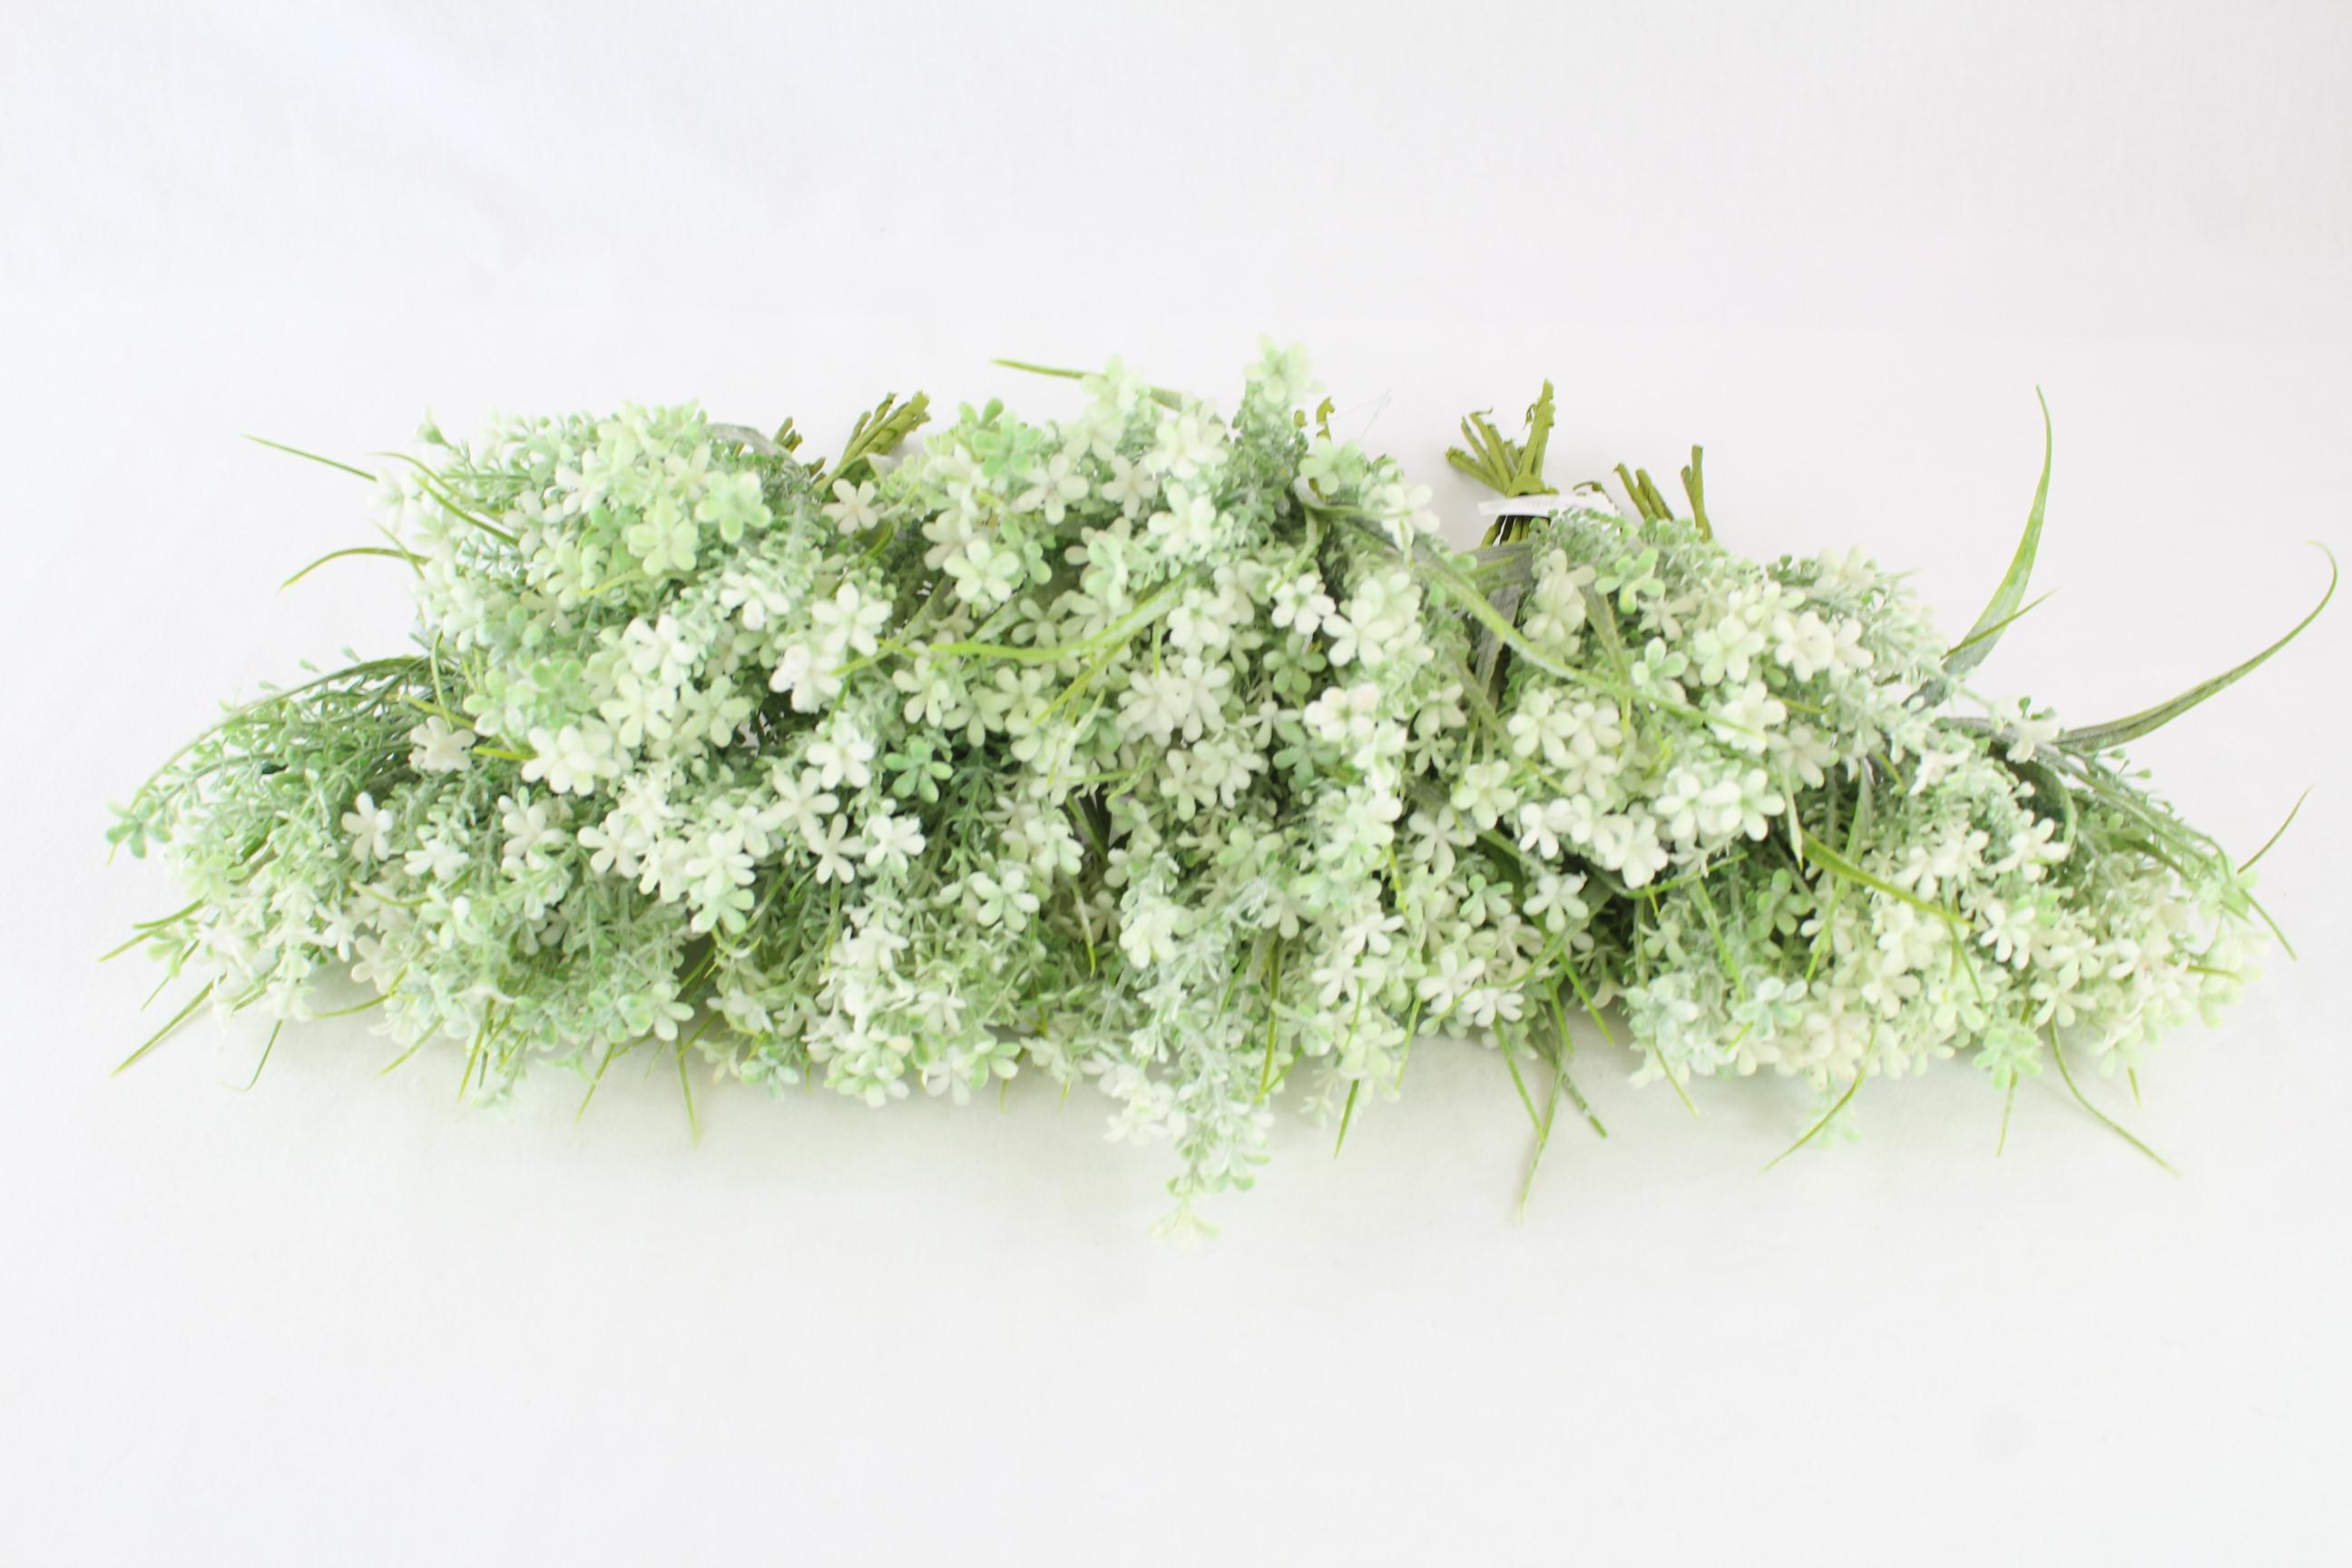 12 x 38cm Flowering Thyme Mixed Bush